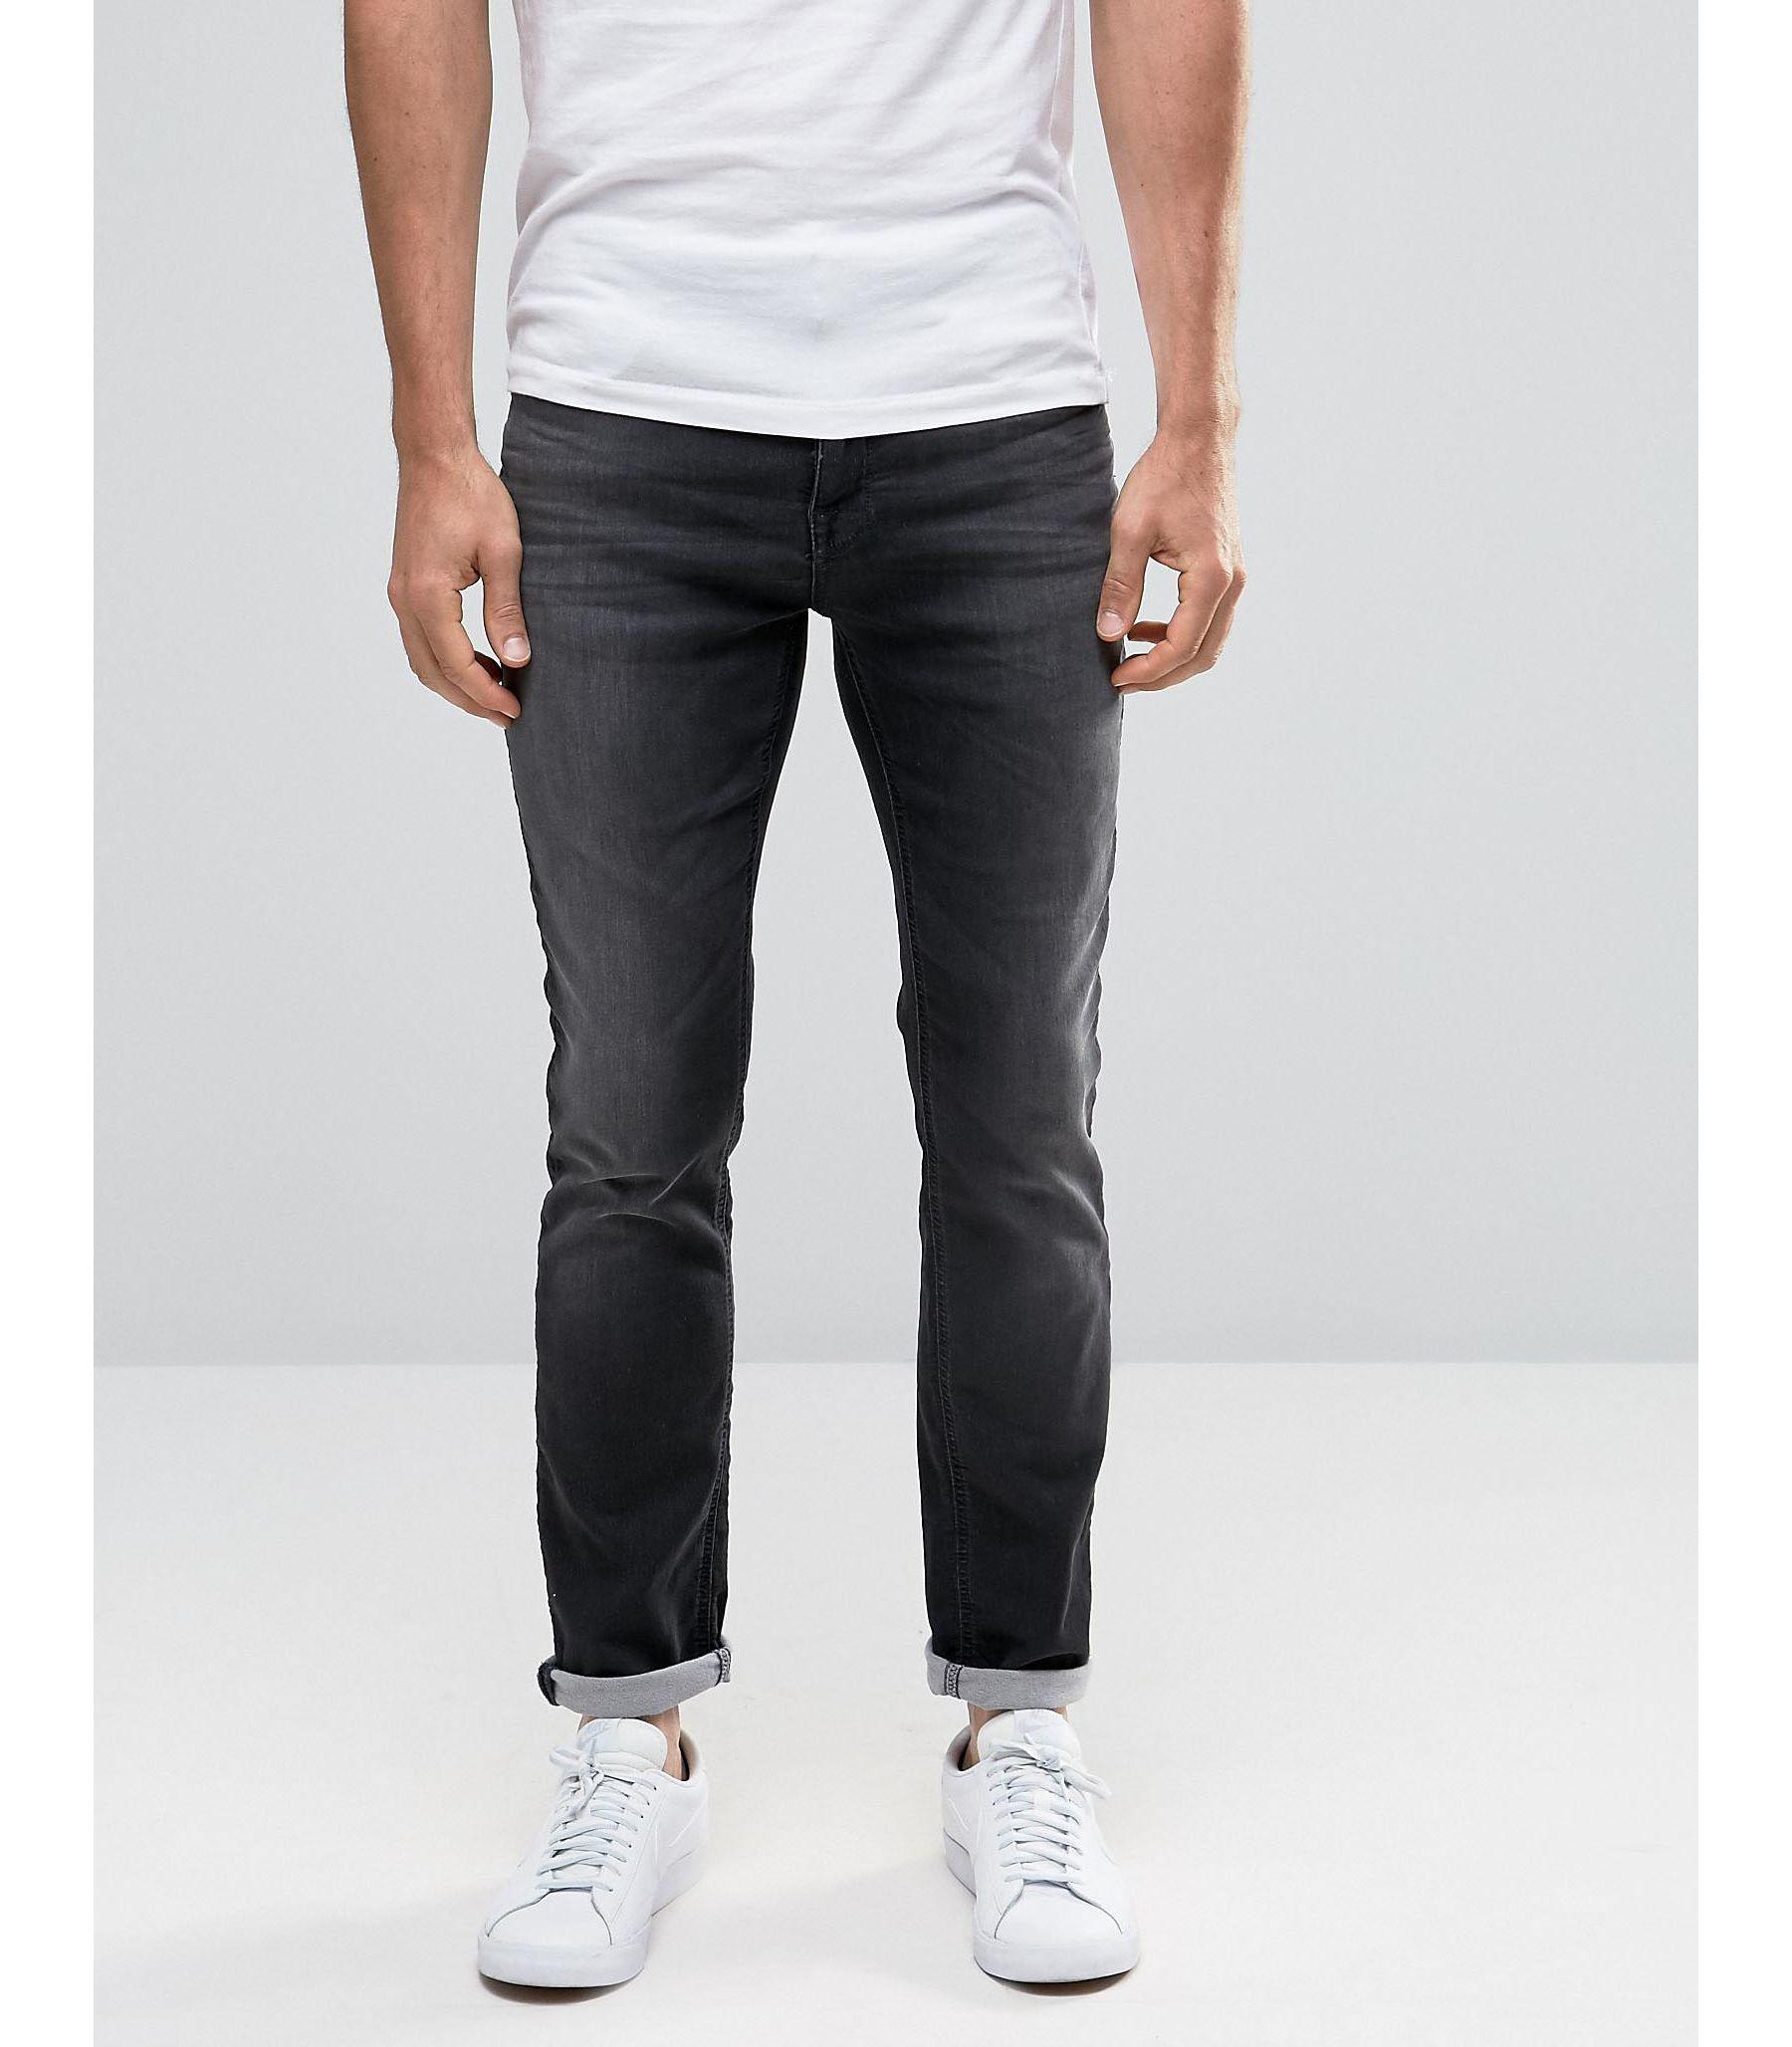 selected elected homme grey wash skinny jersey jeans in super stretch in black for men lyst. Black Bedroom Furniture Sets. Home Design Ideas